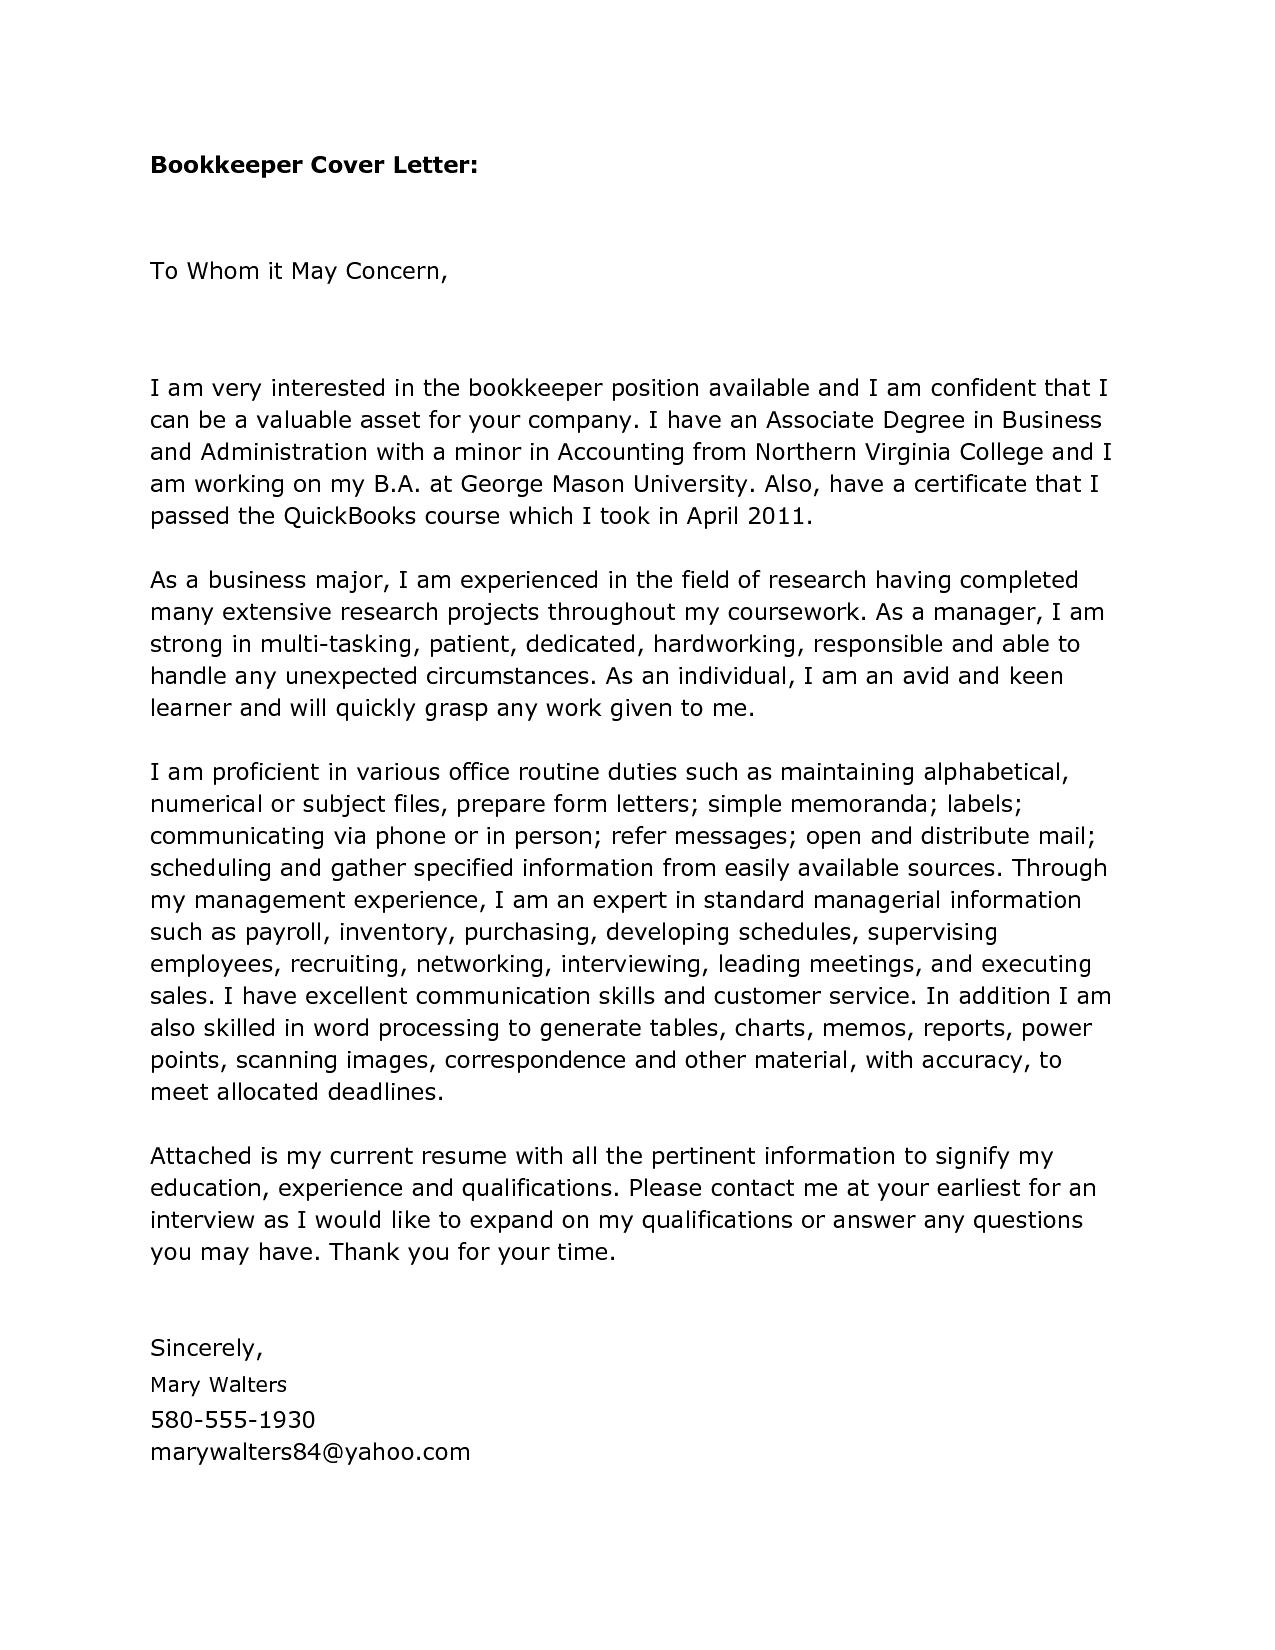 Kkk thesis statement